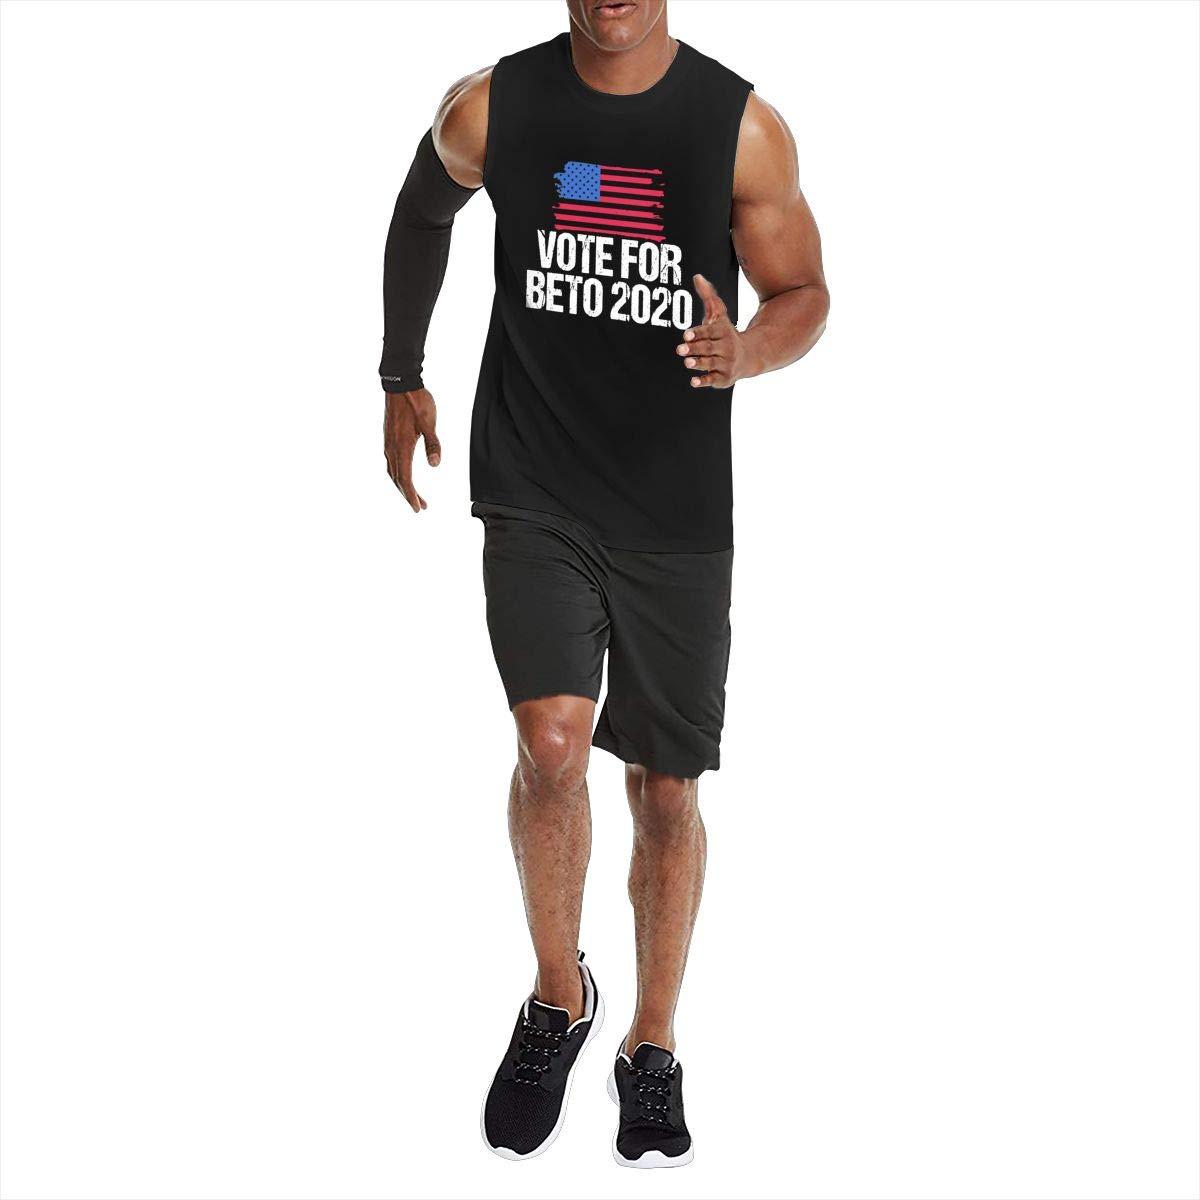 JIELONG Vote for Beto 2020 Mens Sleeveless T-Shirt Muscle T-Shirts Tank Top Black